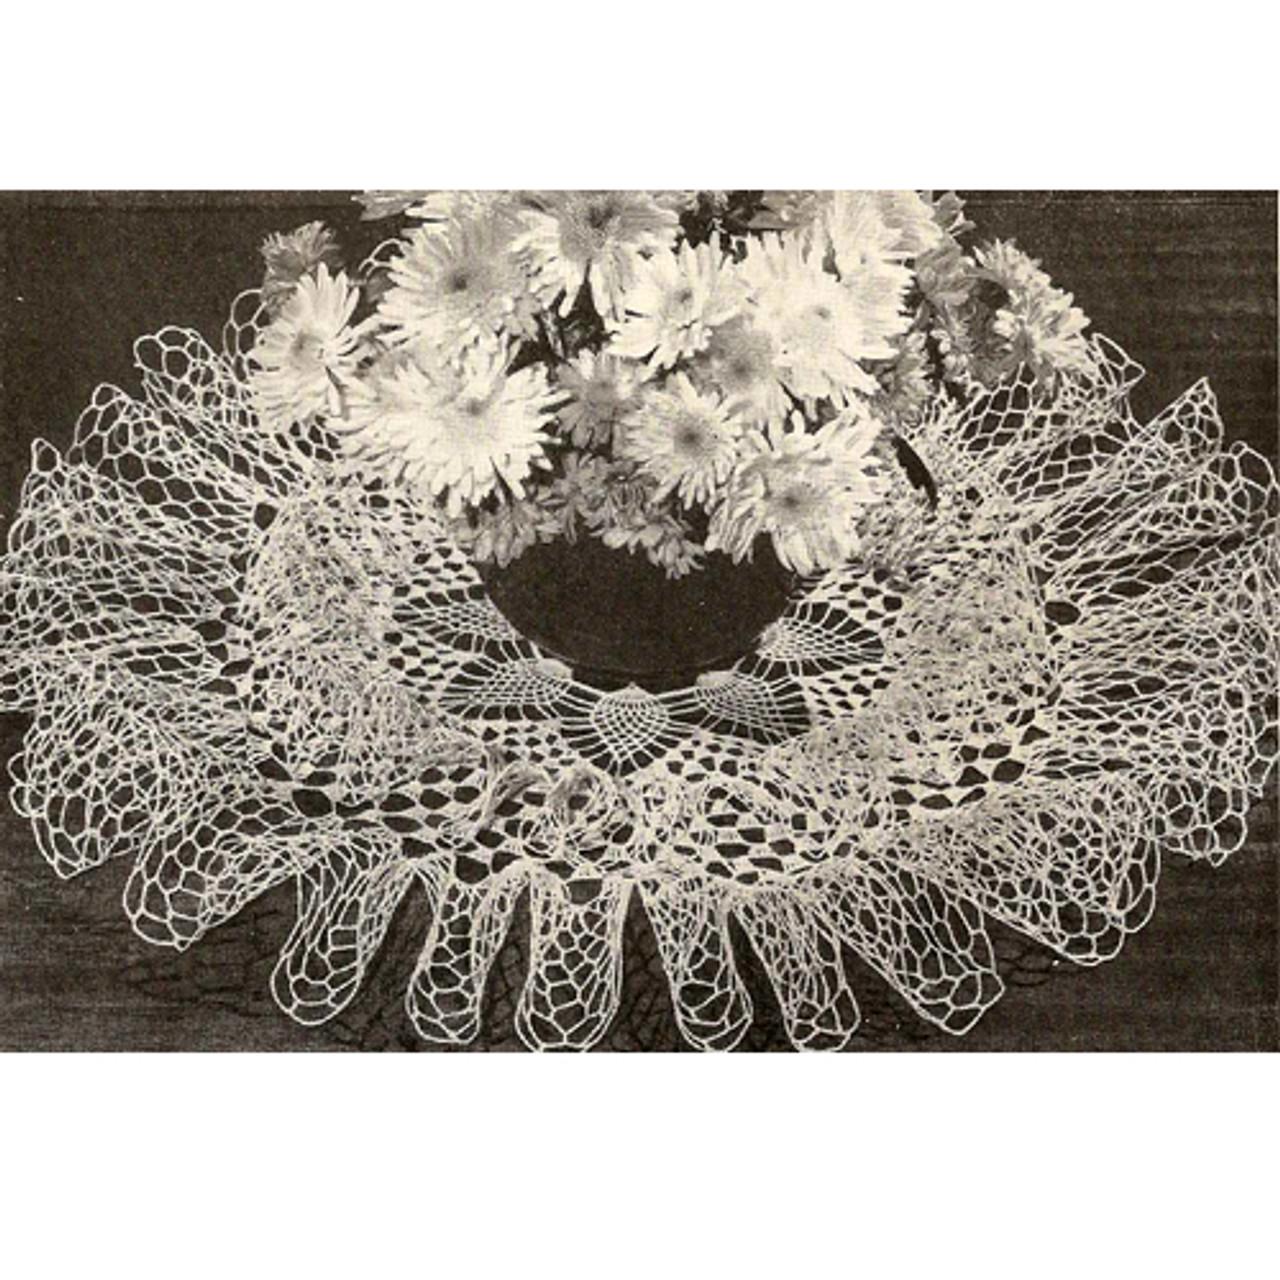 Cascade Crocheted Doily Pattern